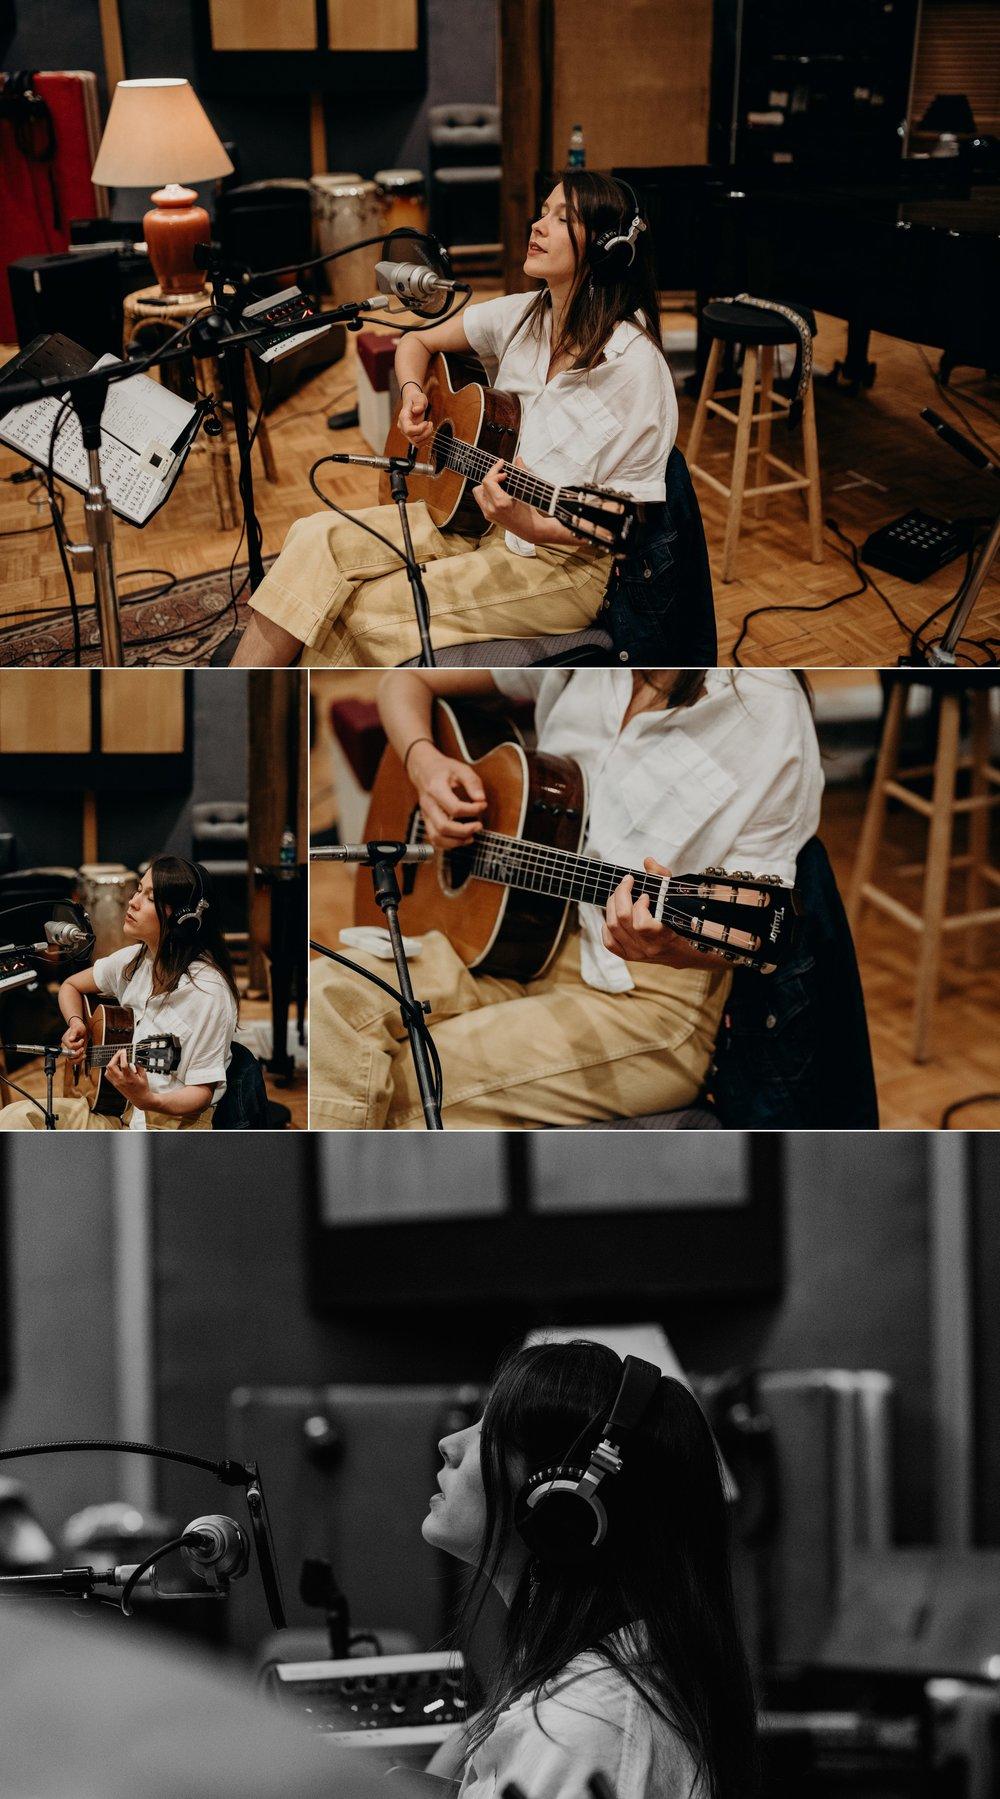 spacesaver austin minneapolis wedding engagement elopement music photographer destination texas minnesota costa rica_0008.jpg